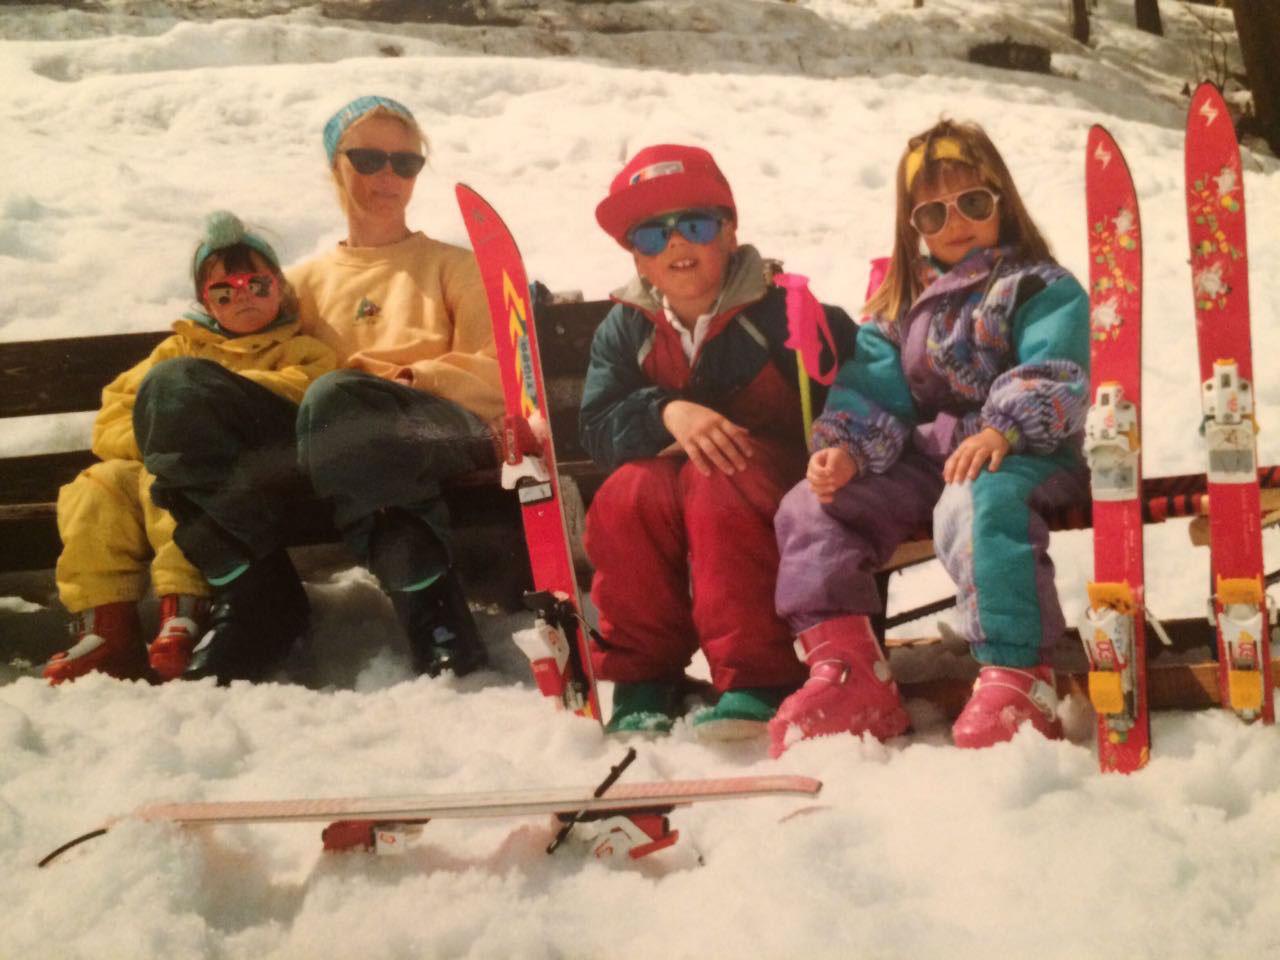 anja-woertge-mountainista-munichmountaingirls-berg-blog-muenchen-kinderfoto-kinder-skifahren